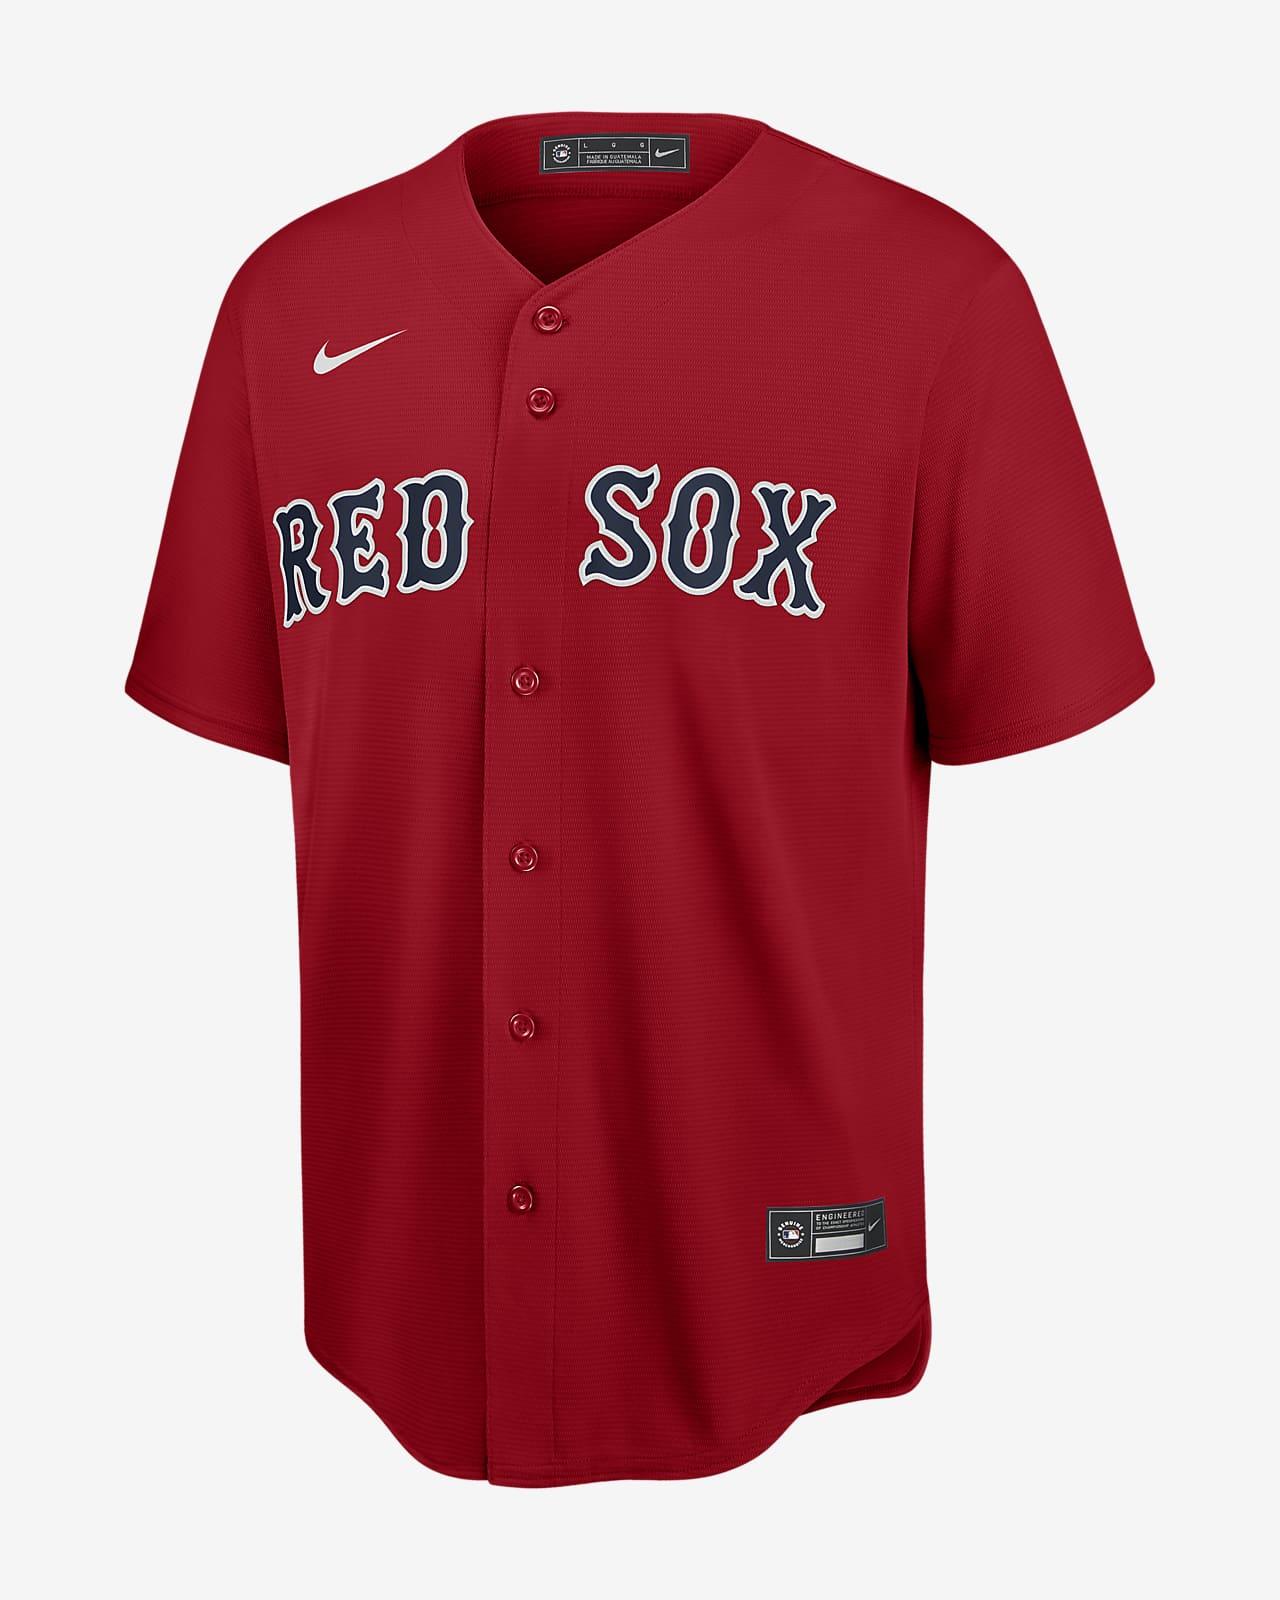 Andrew Benintendi Boston Red Sox Spring Training Baseball Player Jersey